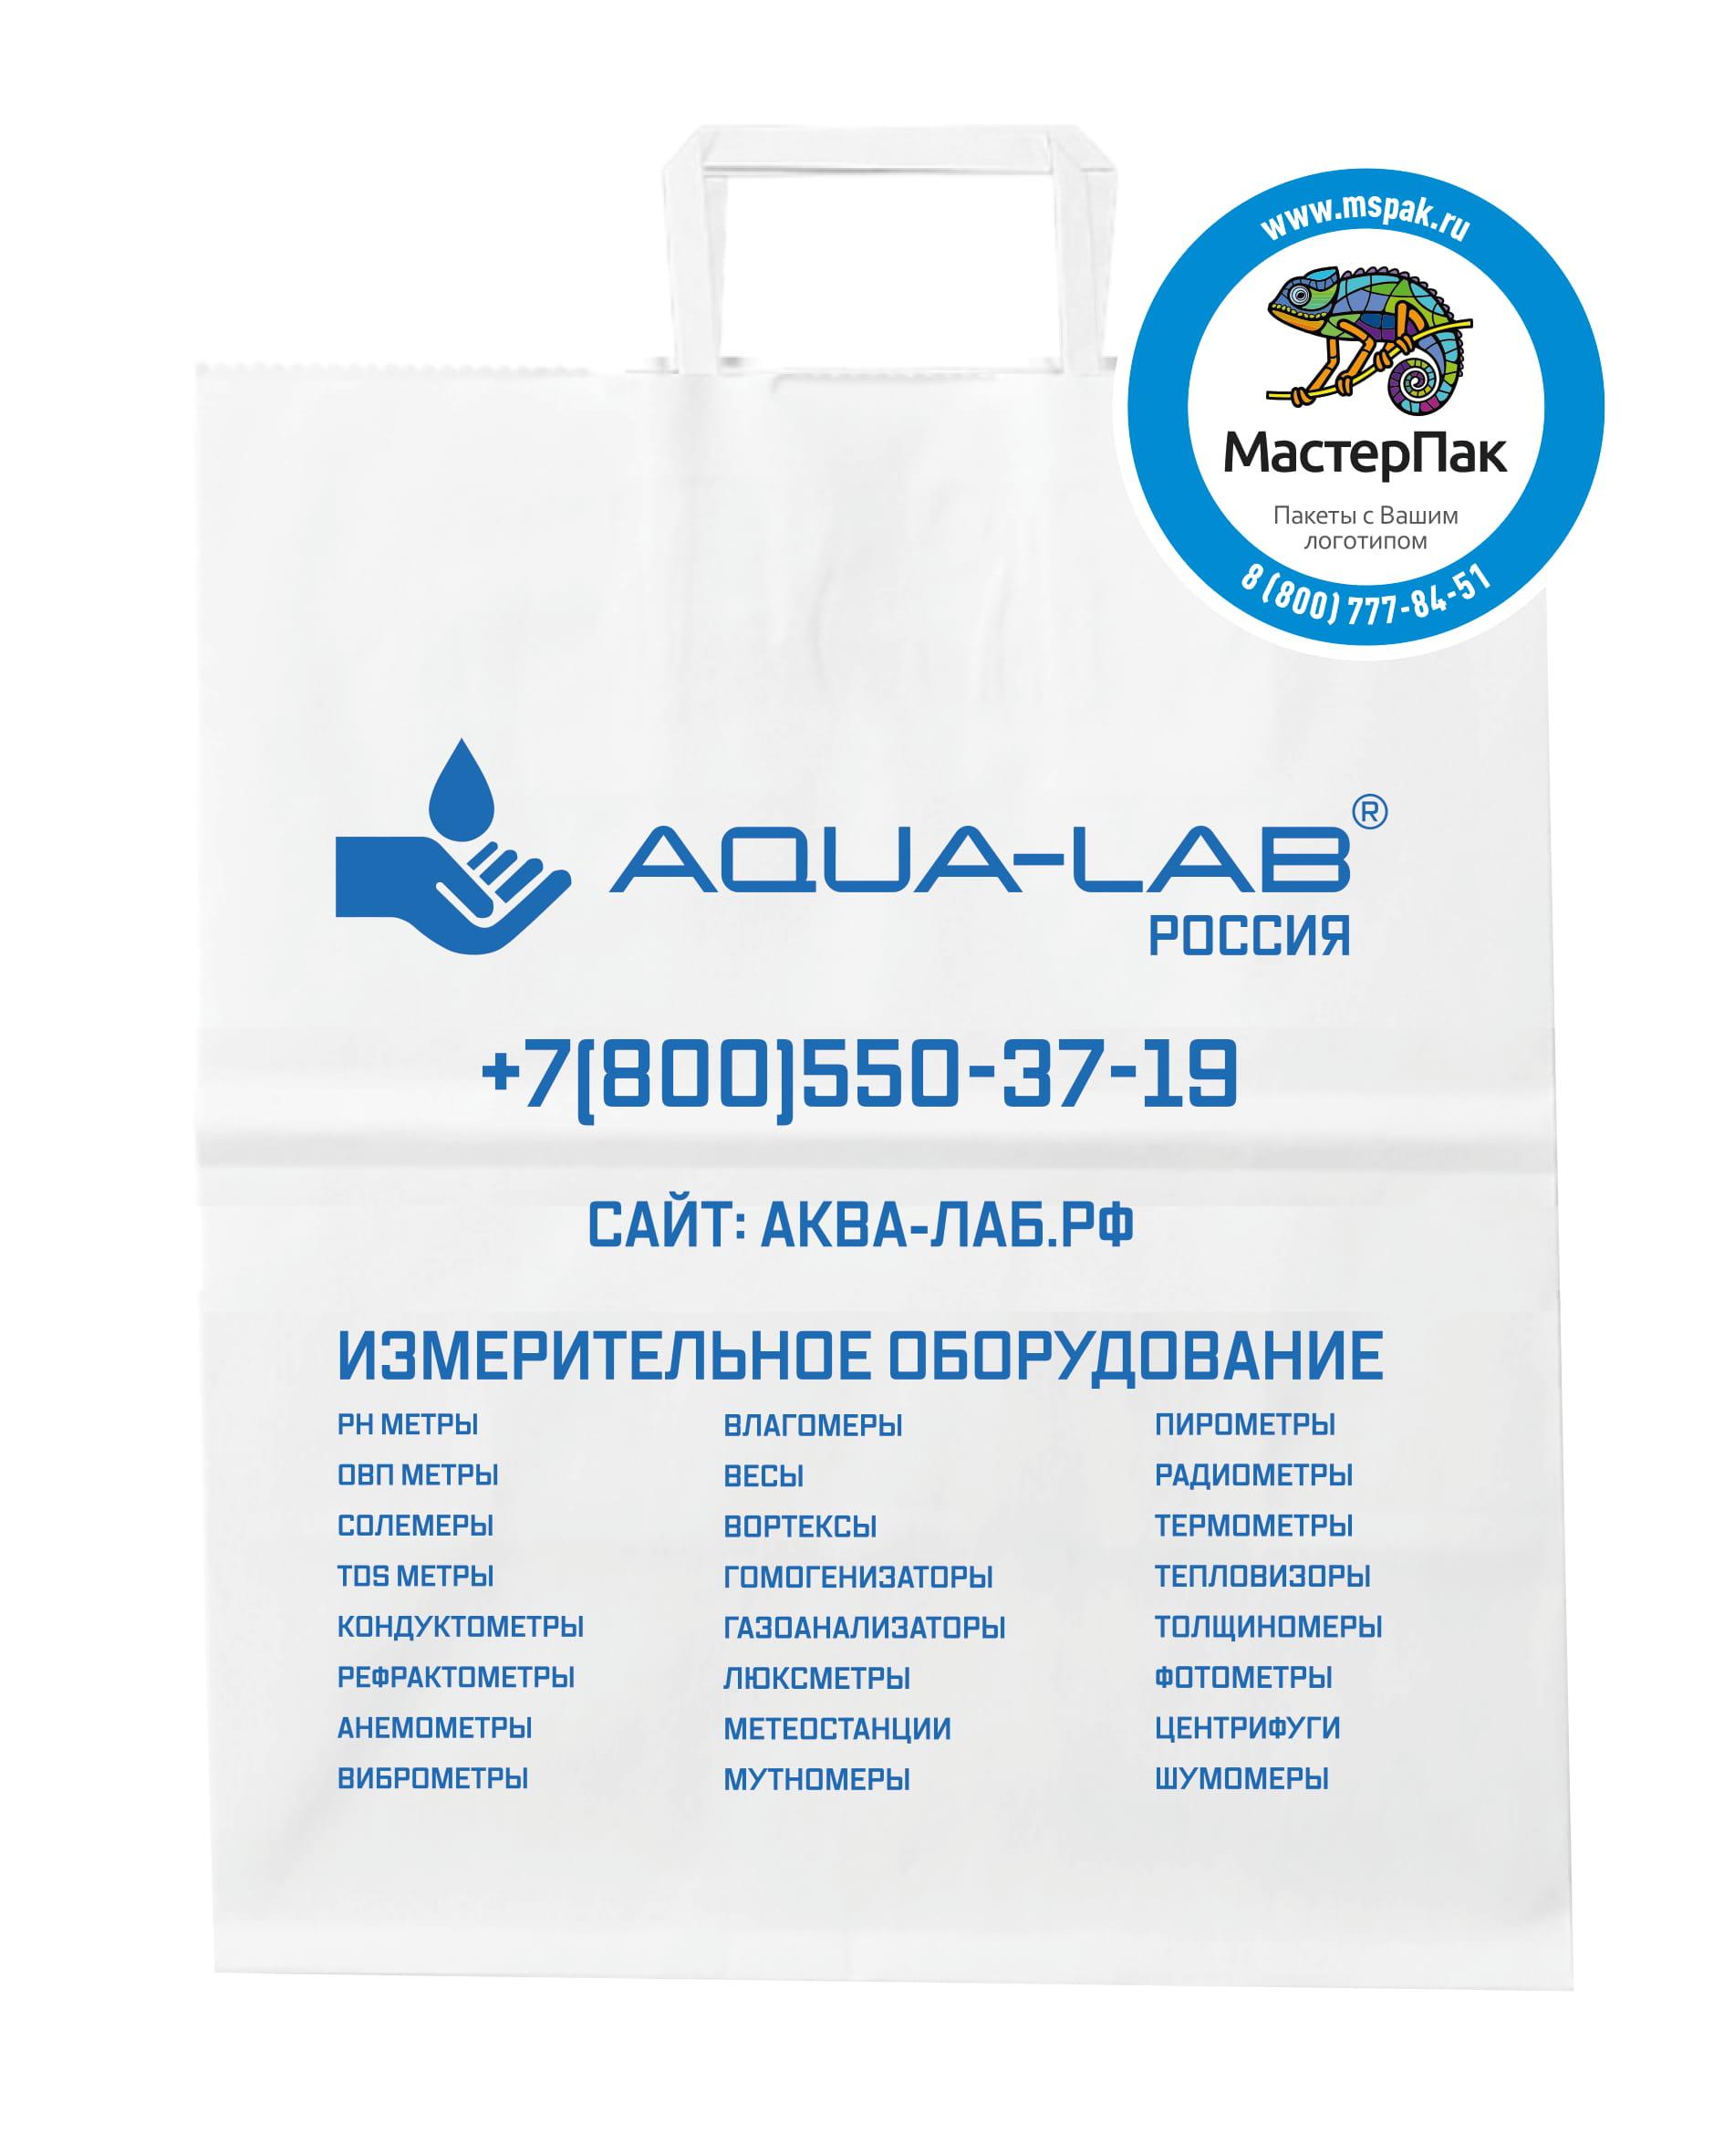 Пакет крафт, бумажный с логотипом Aqua-Lab, Москва, 24*28 см